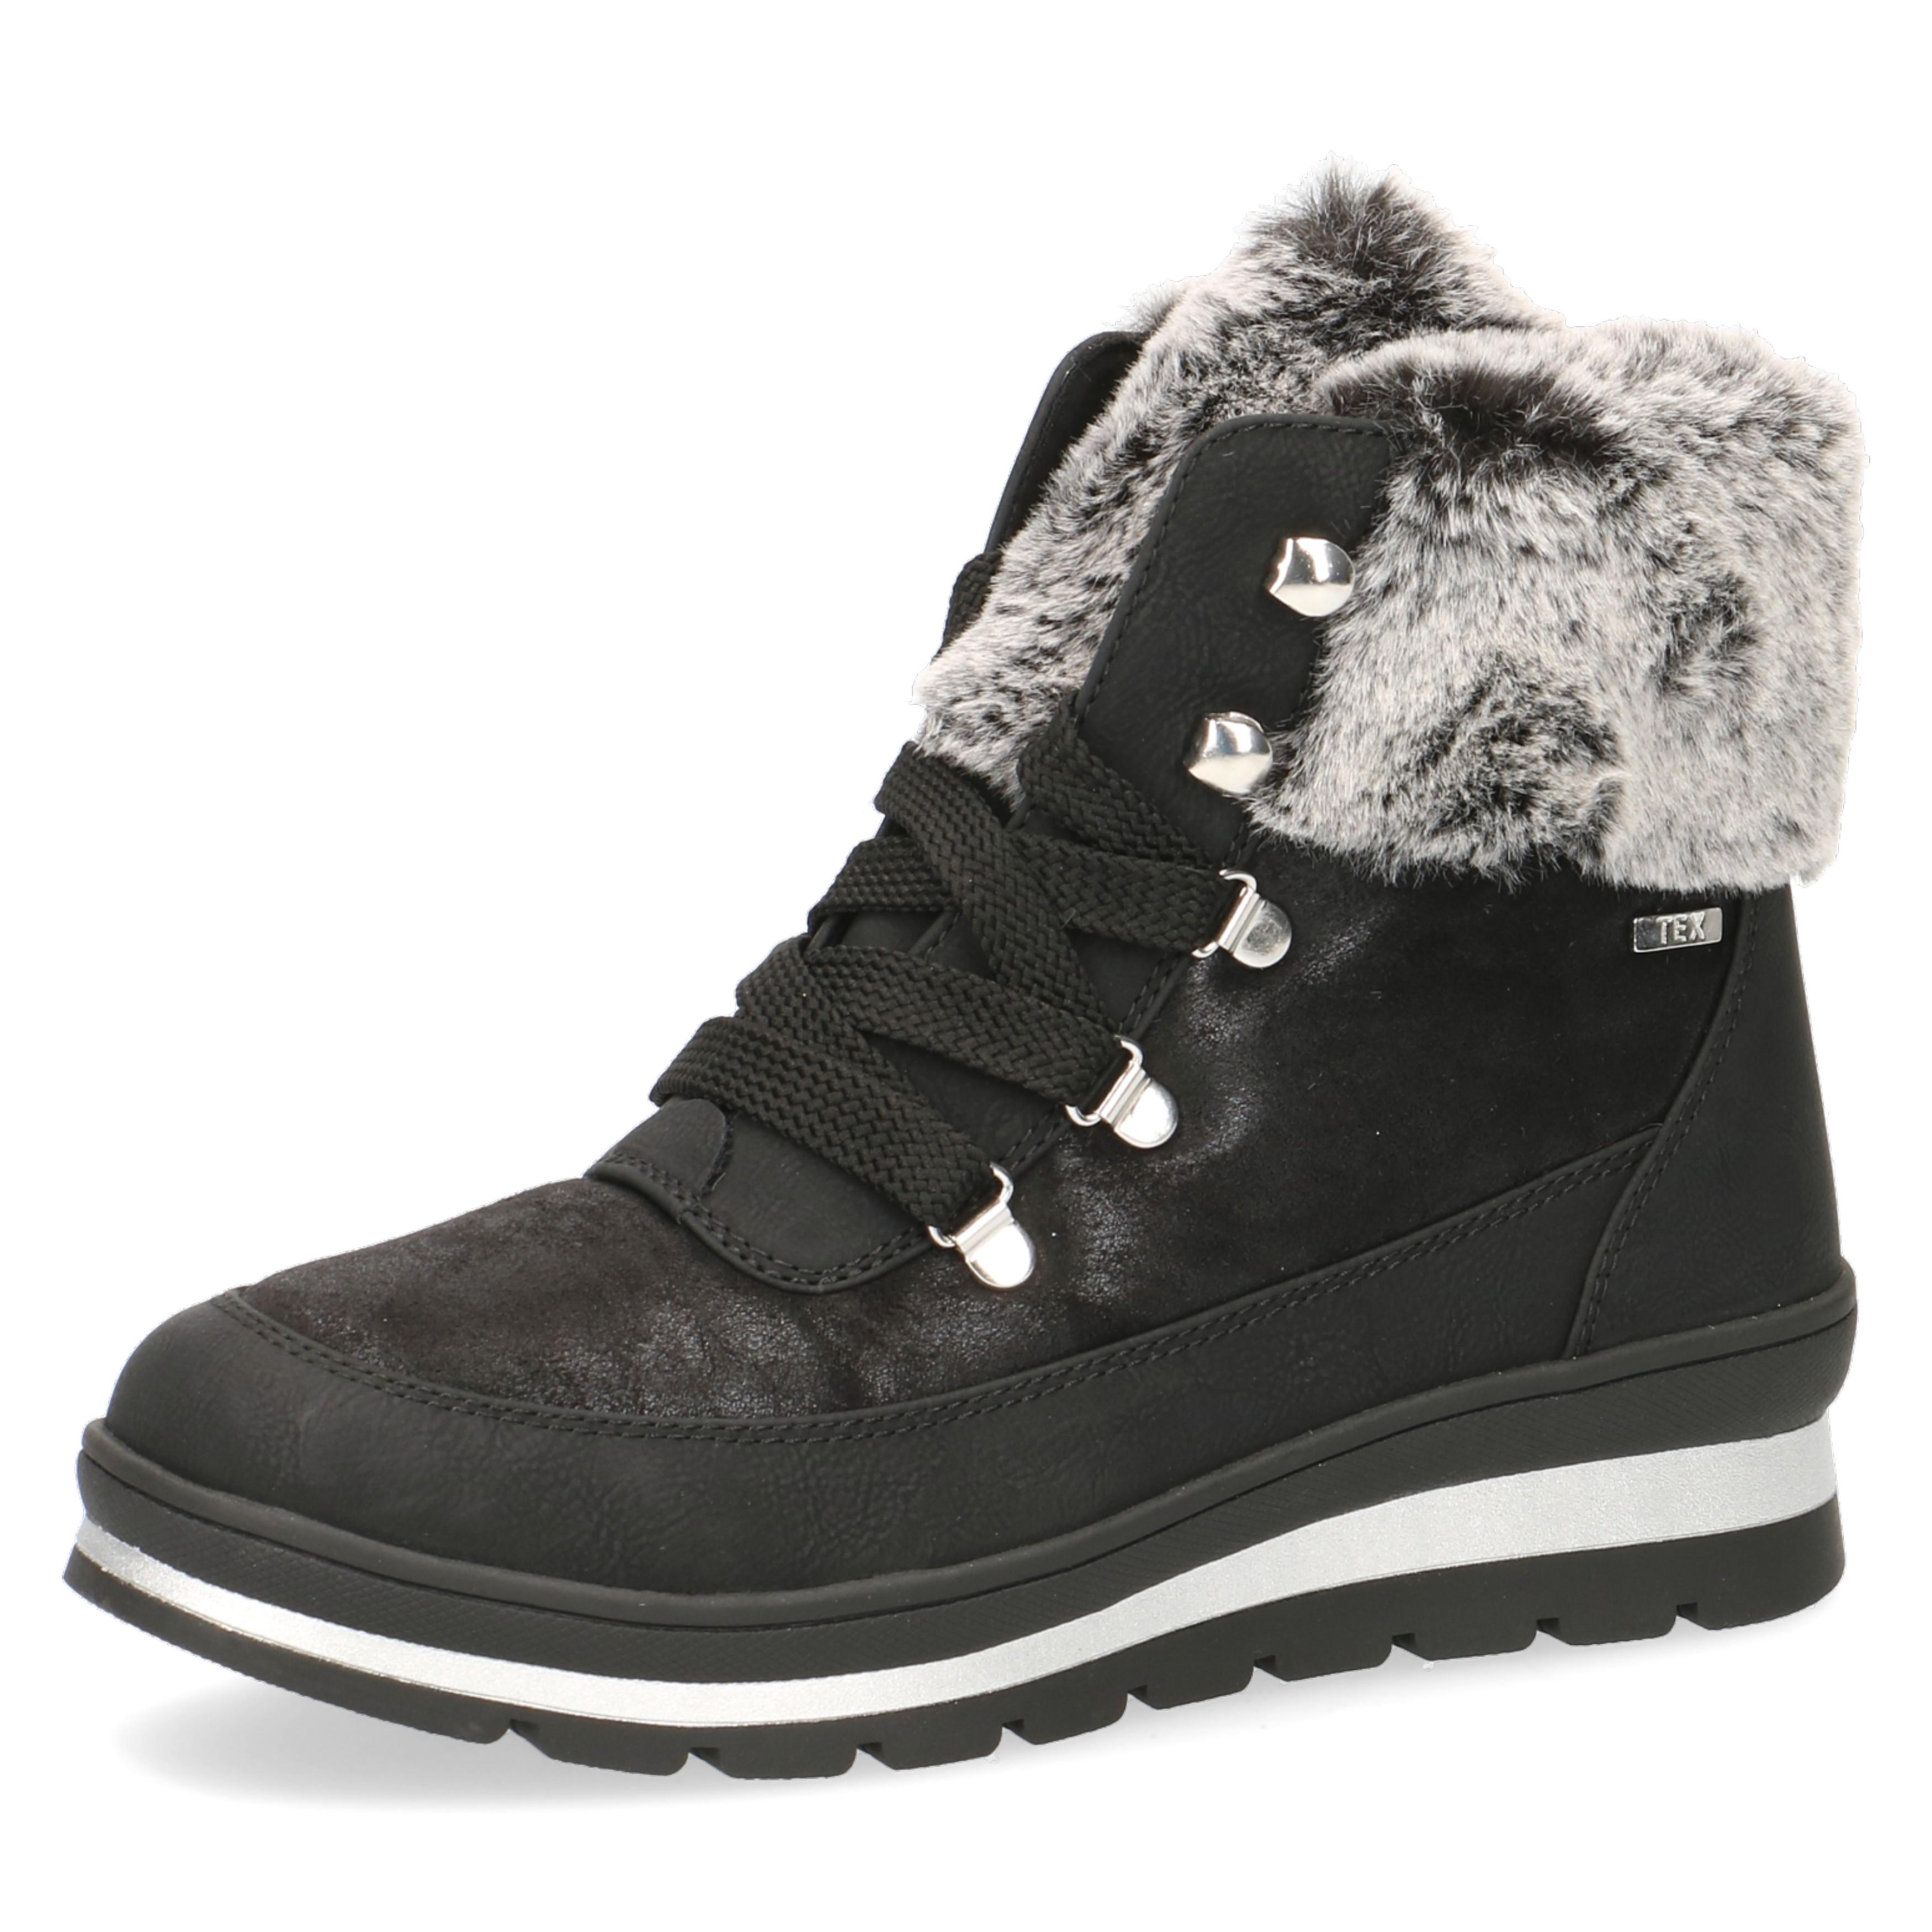 Caprice Black Suede Leather Fur Trim Snow Boots